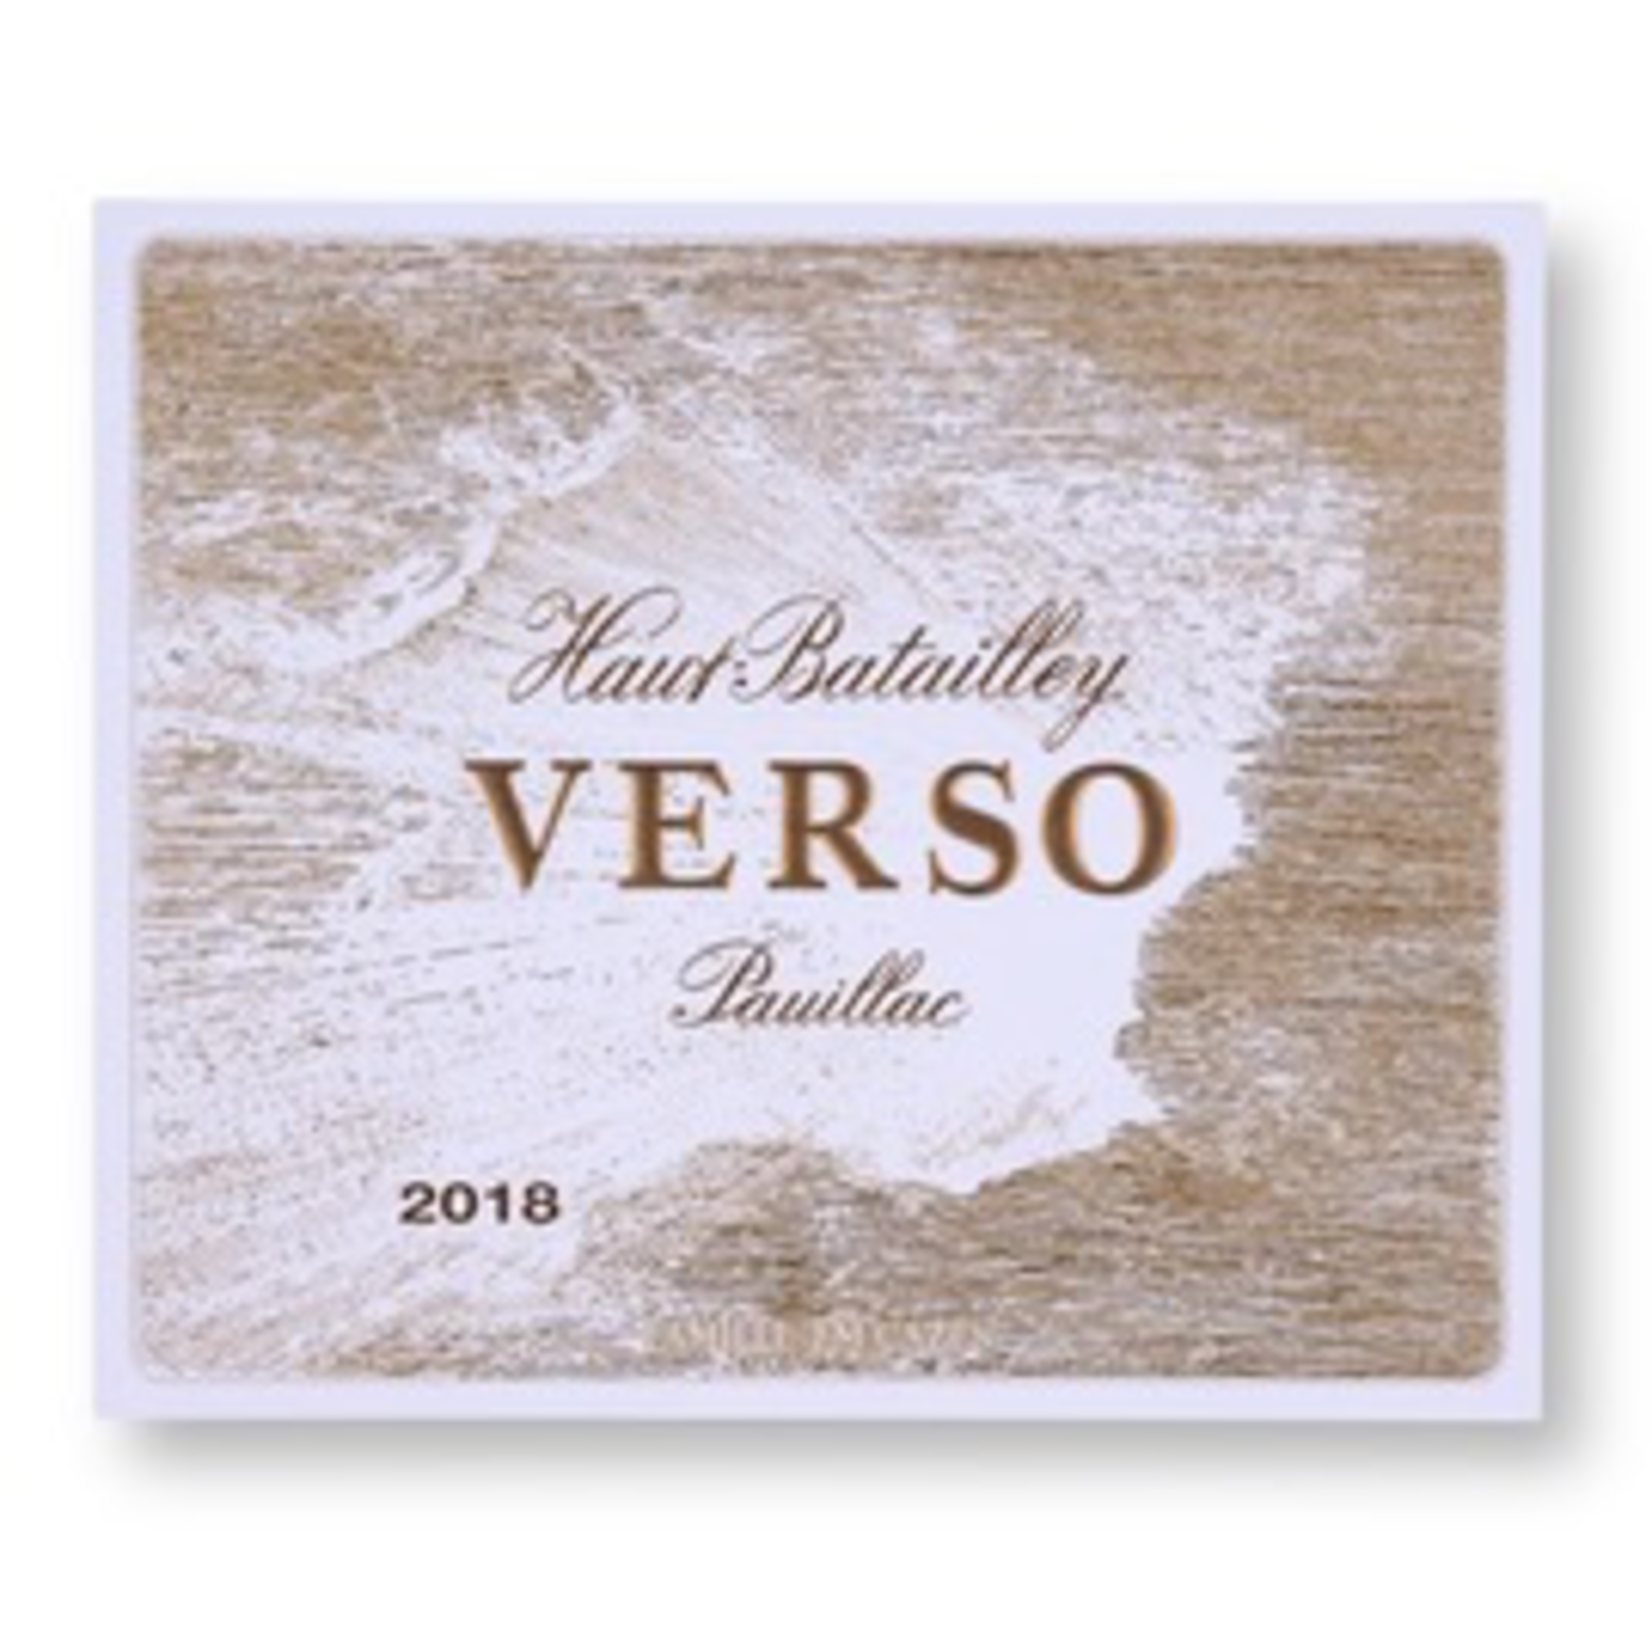 Wine Chateau Haut-Batailley Pauillac Verso 2018 375ml